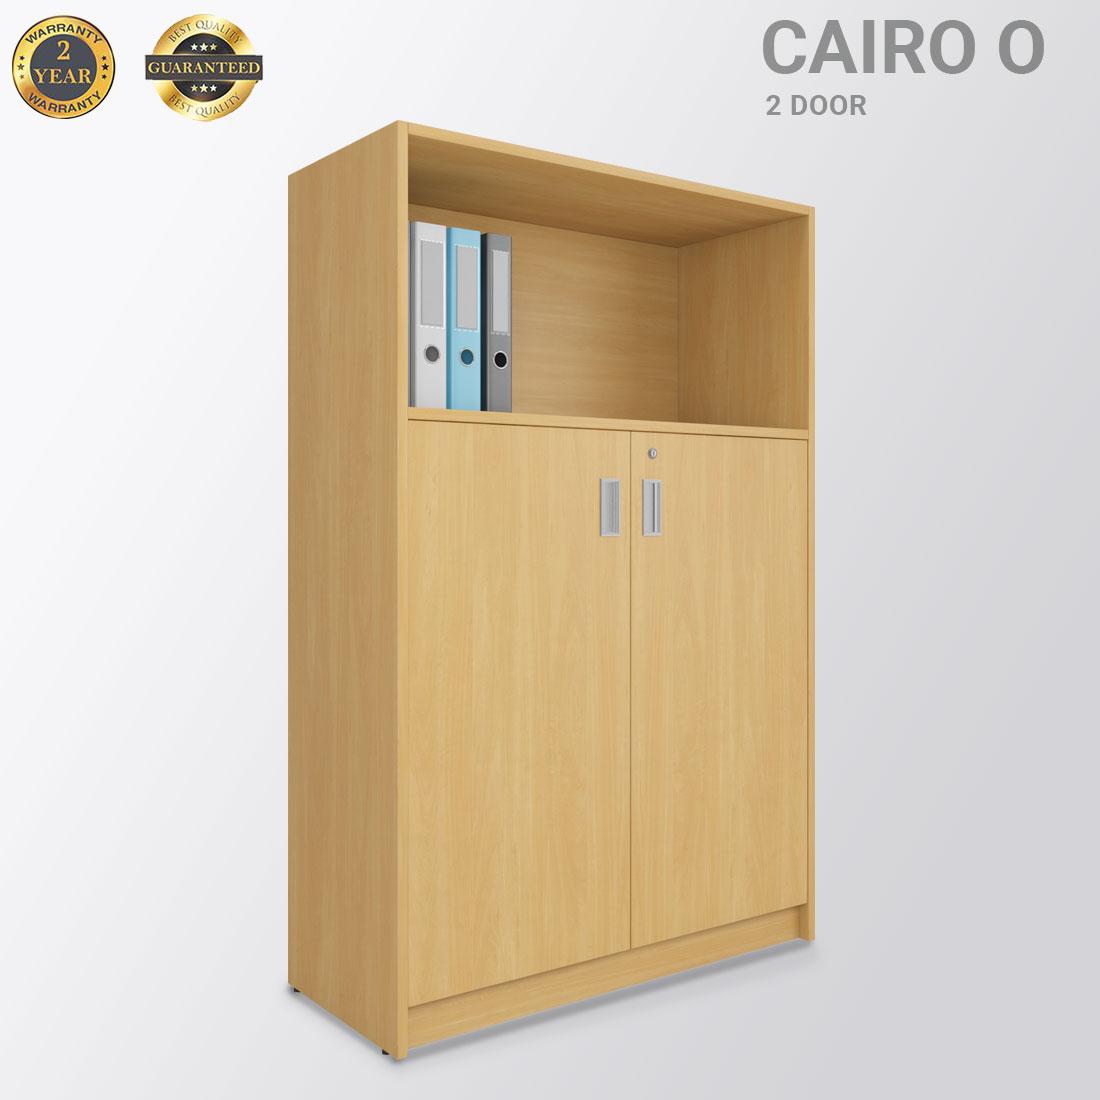 CAIRO O